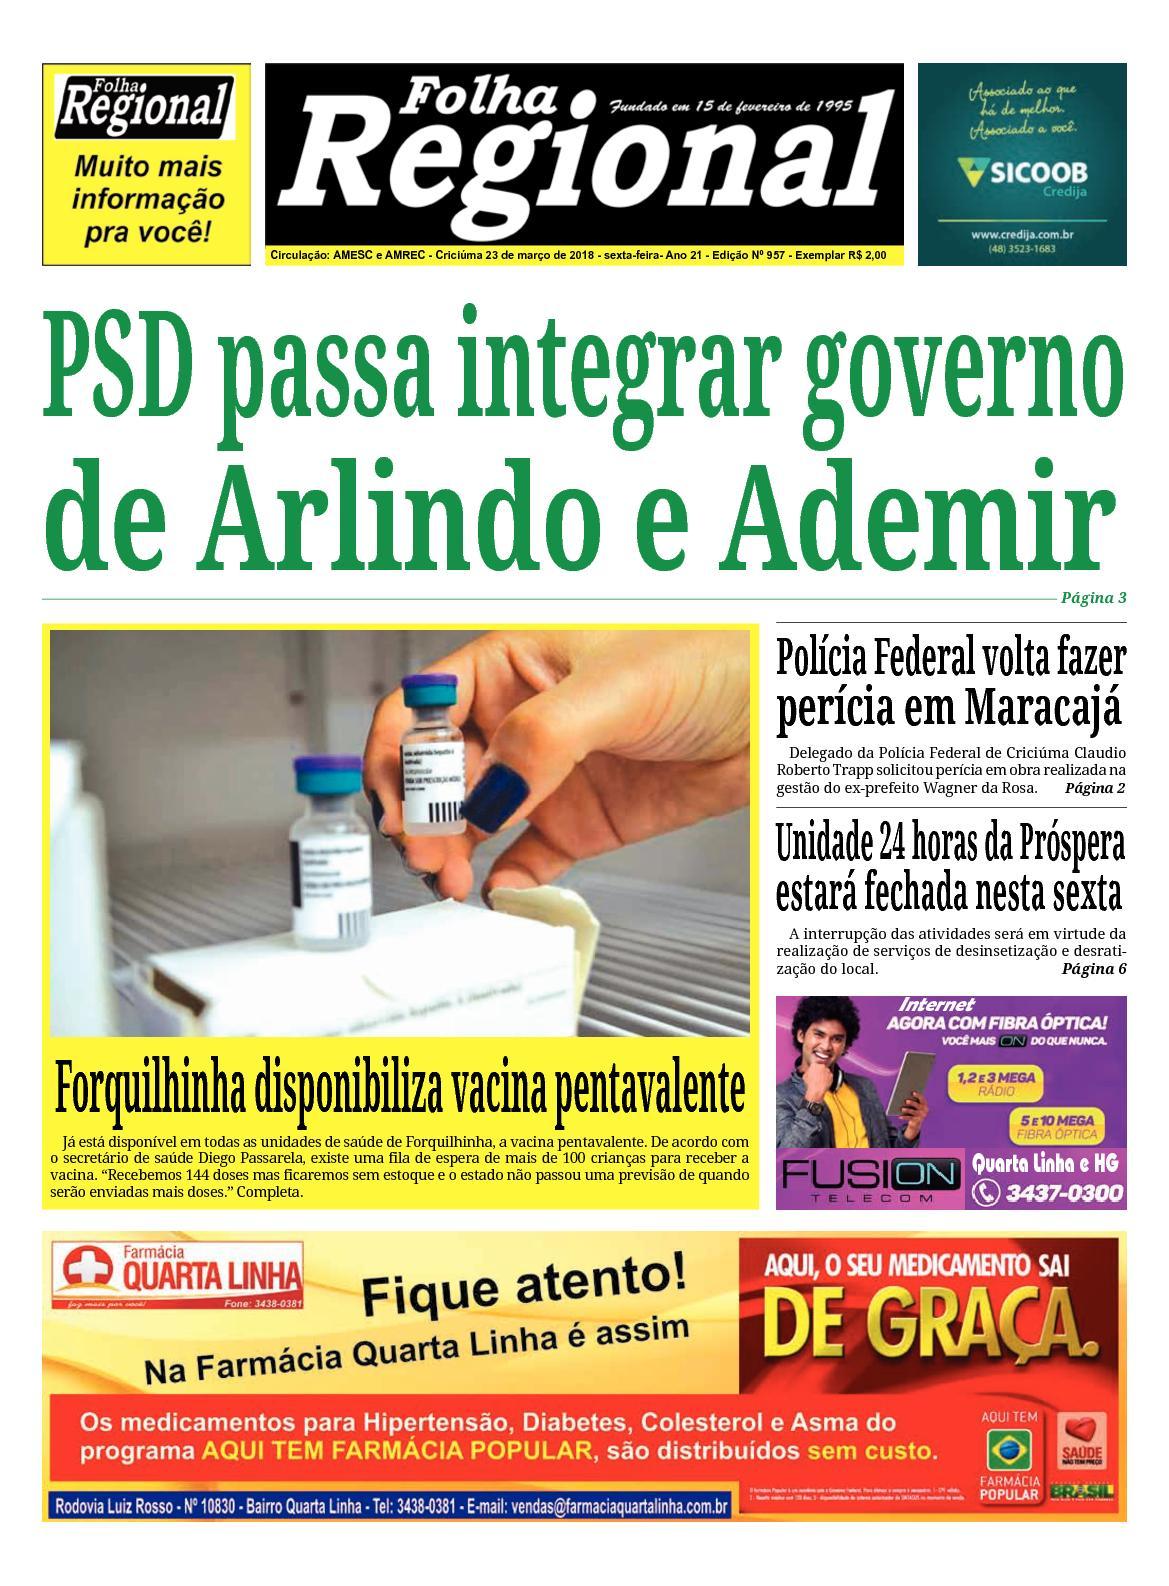 Folha Regional Ed.957 - 23/03/2018